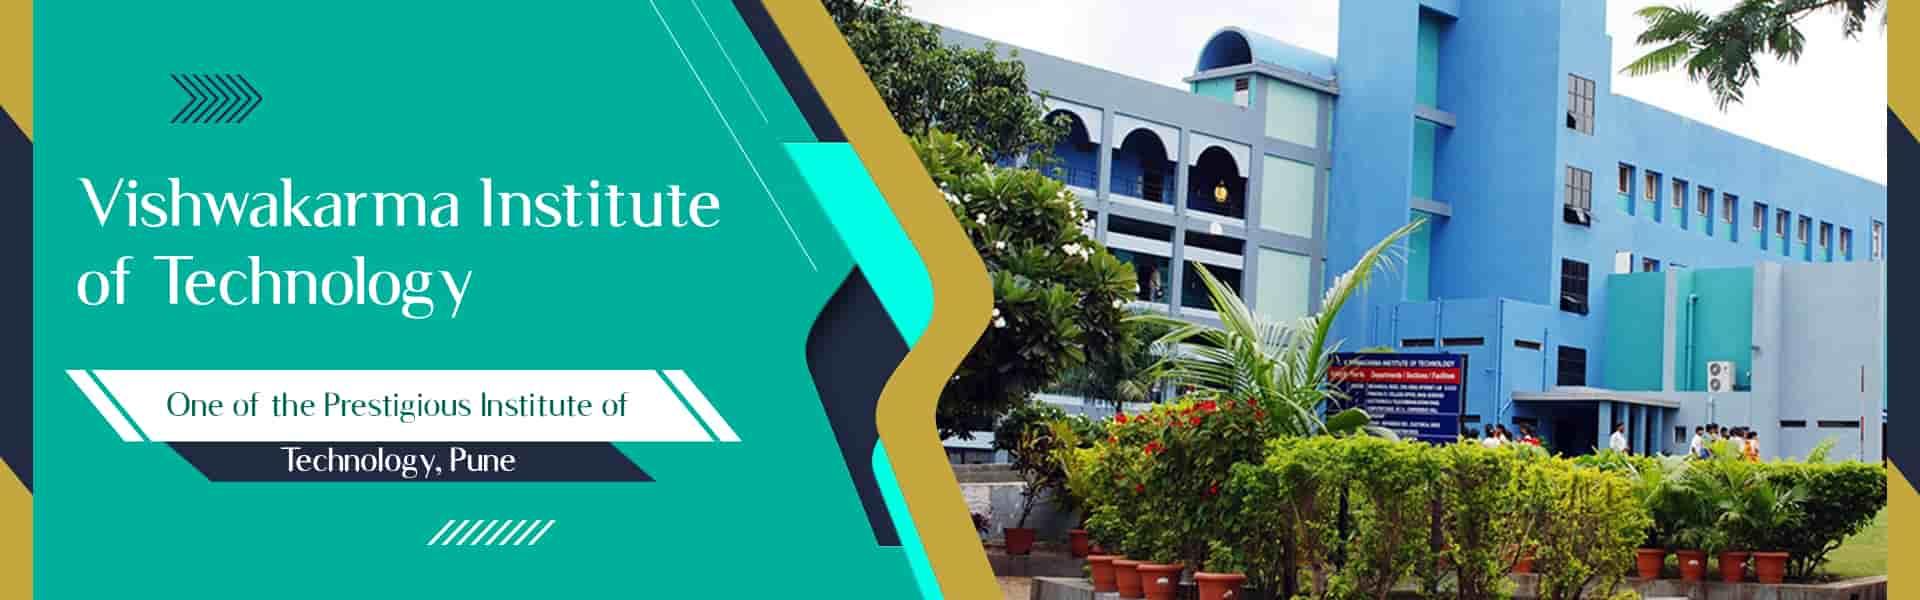 Vishwakarma Institute of Technology Pune